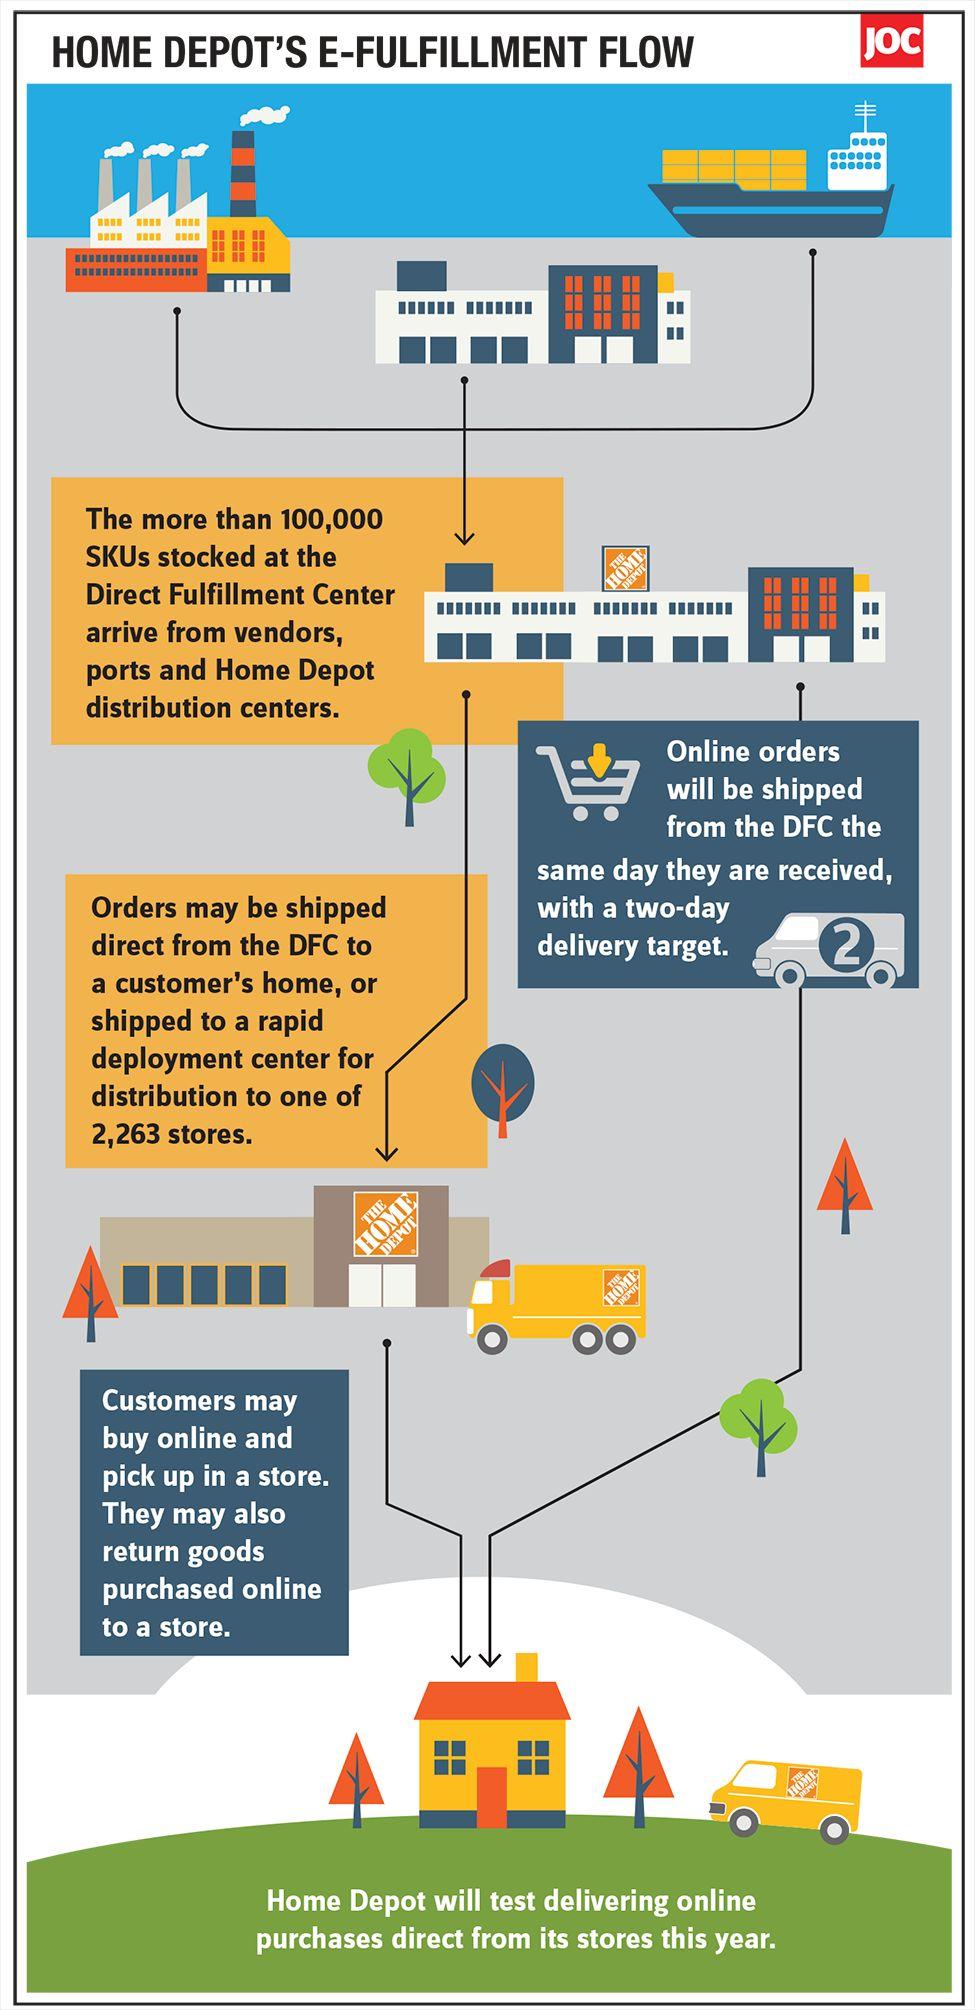 fd9b5d3624d Home Depot opens second fulfillment center dedicated to e-commerce